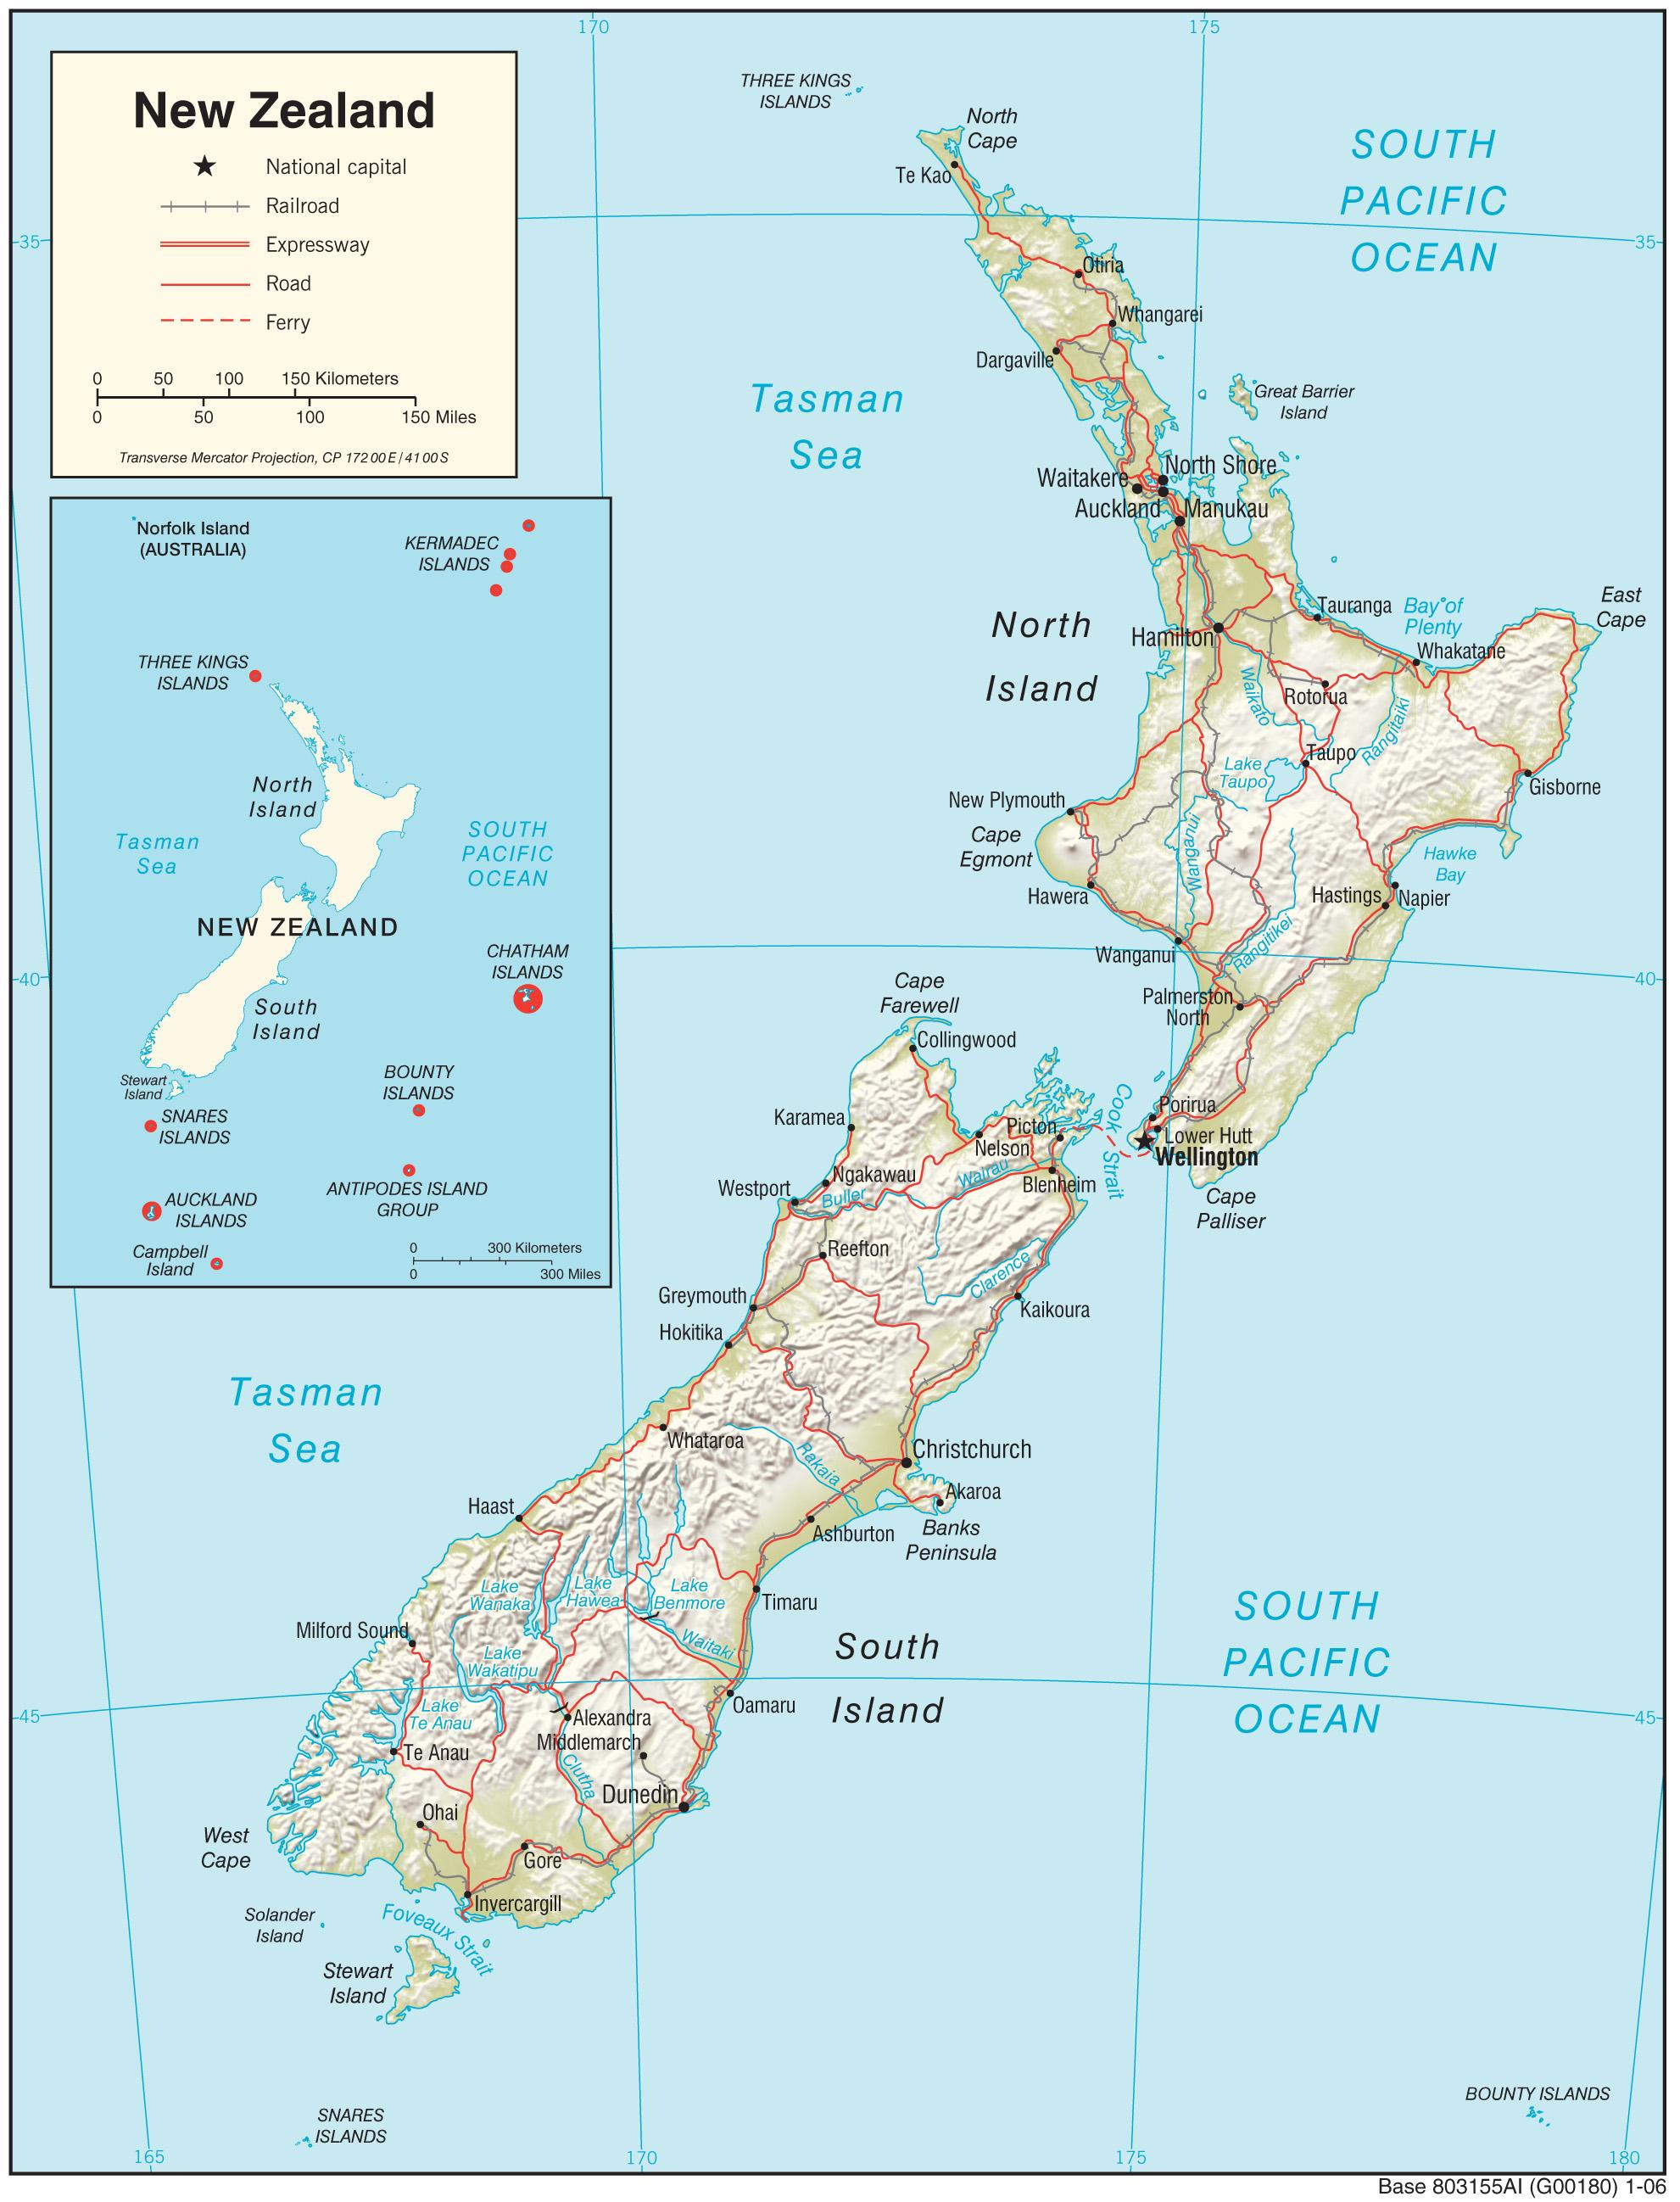 Cartina Nuova Zelanda.Nuova Zelanda Mappa Nuova Zelanda Map Hd Australia E Nuova Zelanda Oceania